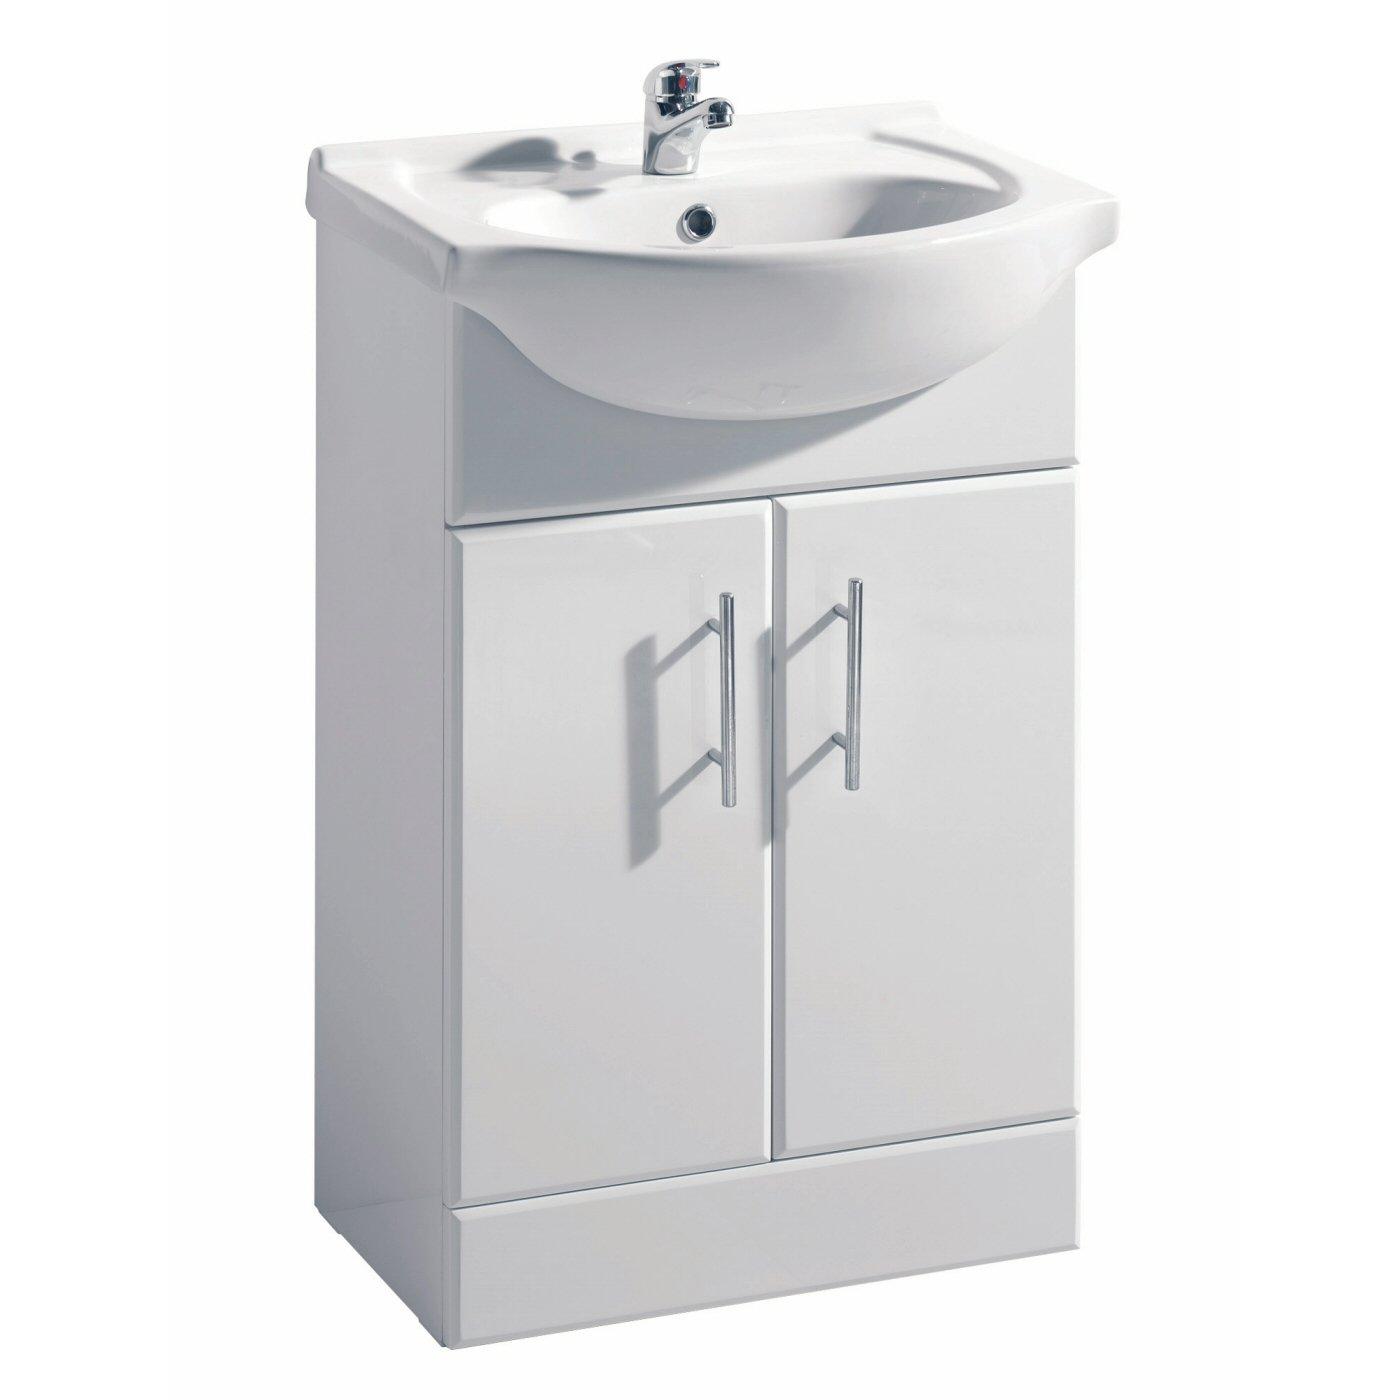 White bathroom sinks - White Gloss Bathroom Vanity Unit Basin Sink 550mm Cloakroom Storage Cabinet Ceramic Furniture 5 Year Guarantee Amazon Co Uk Kitchen Home